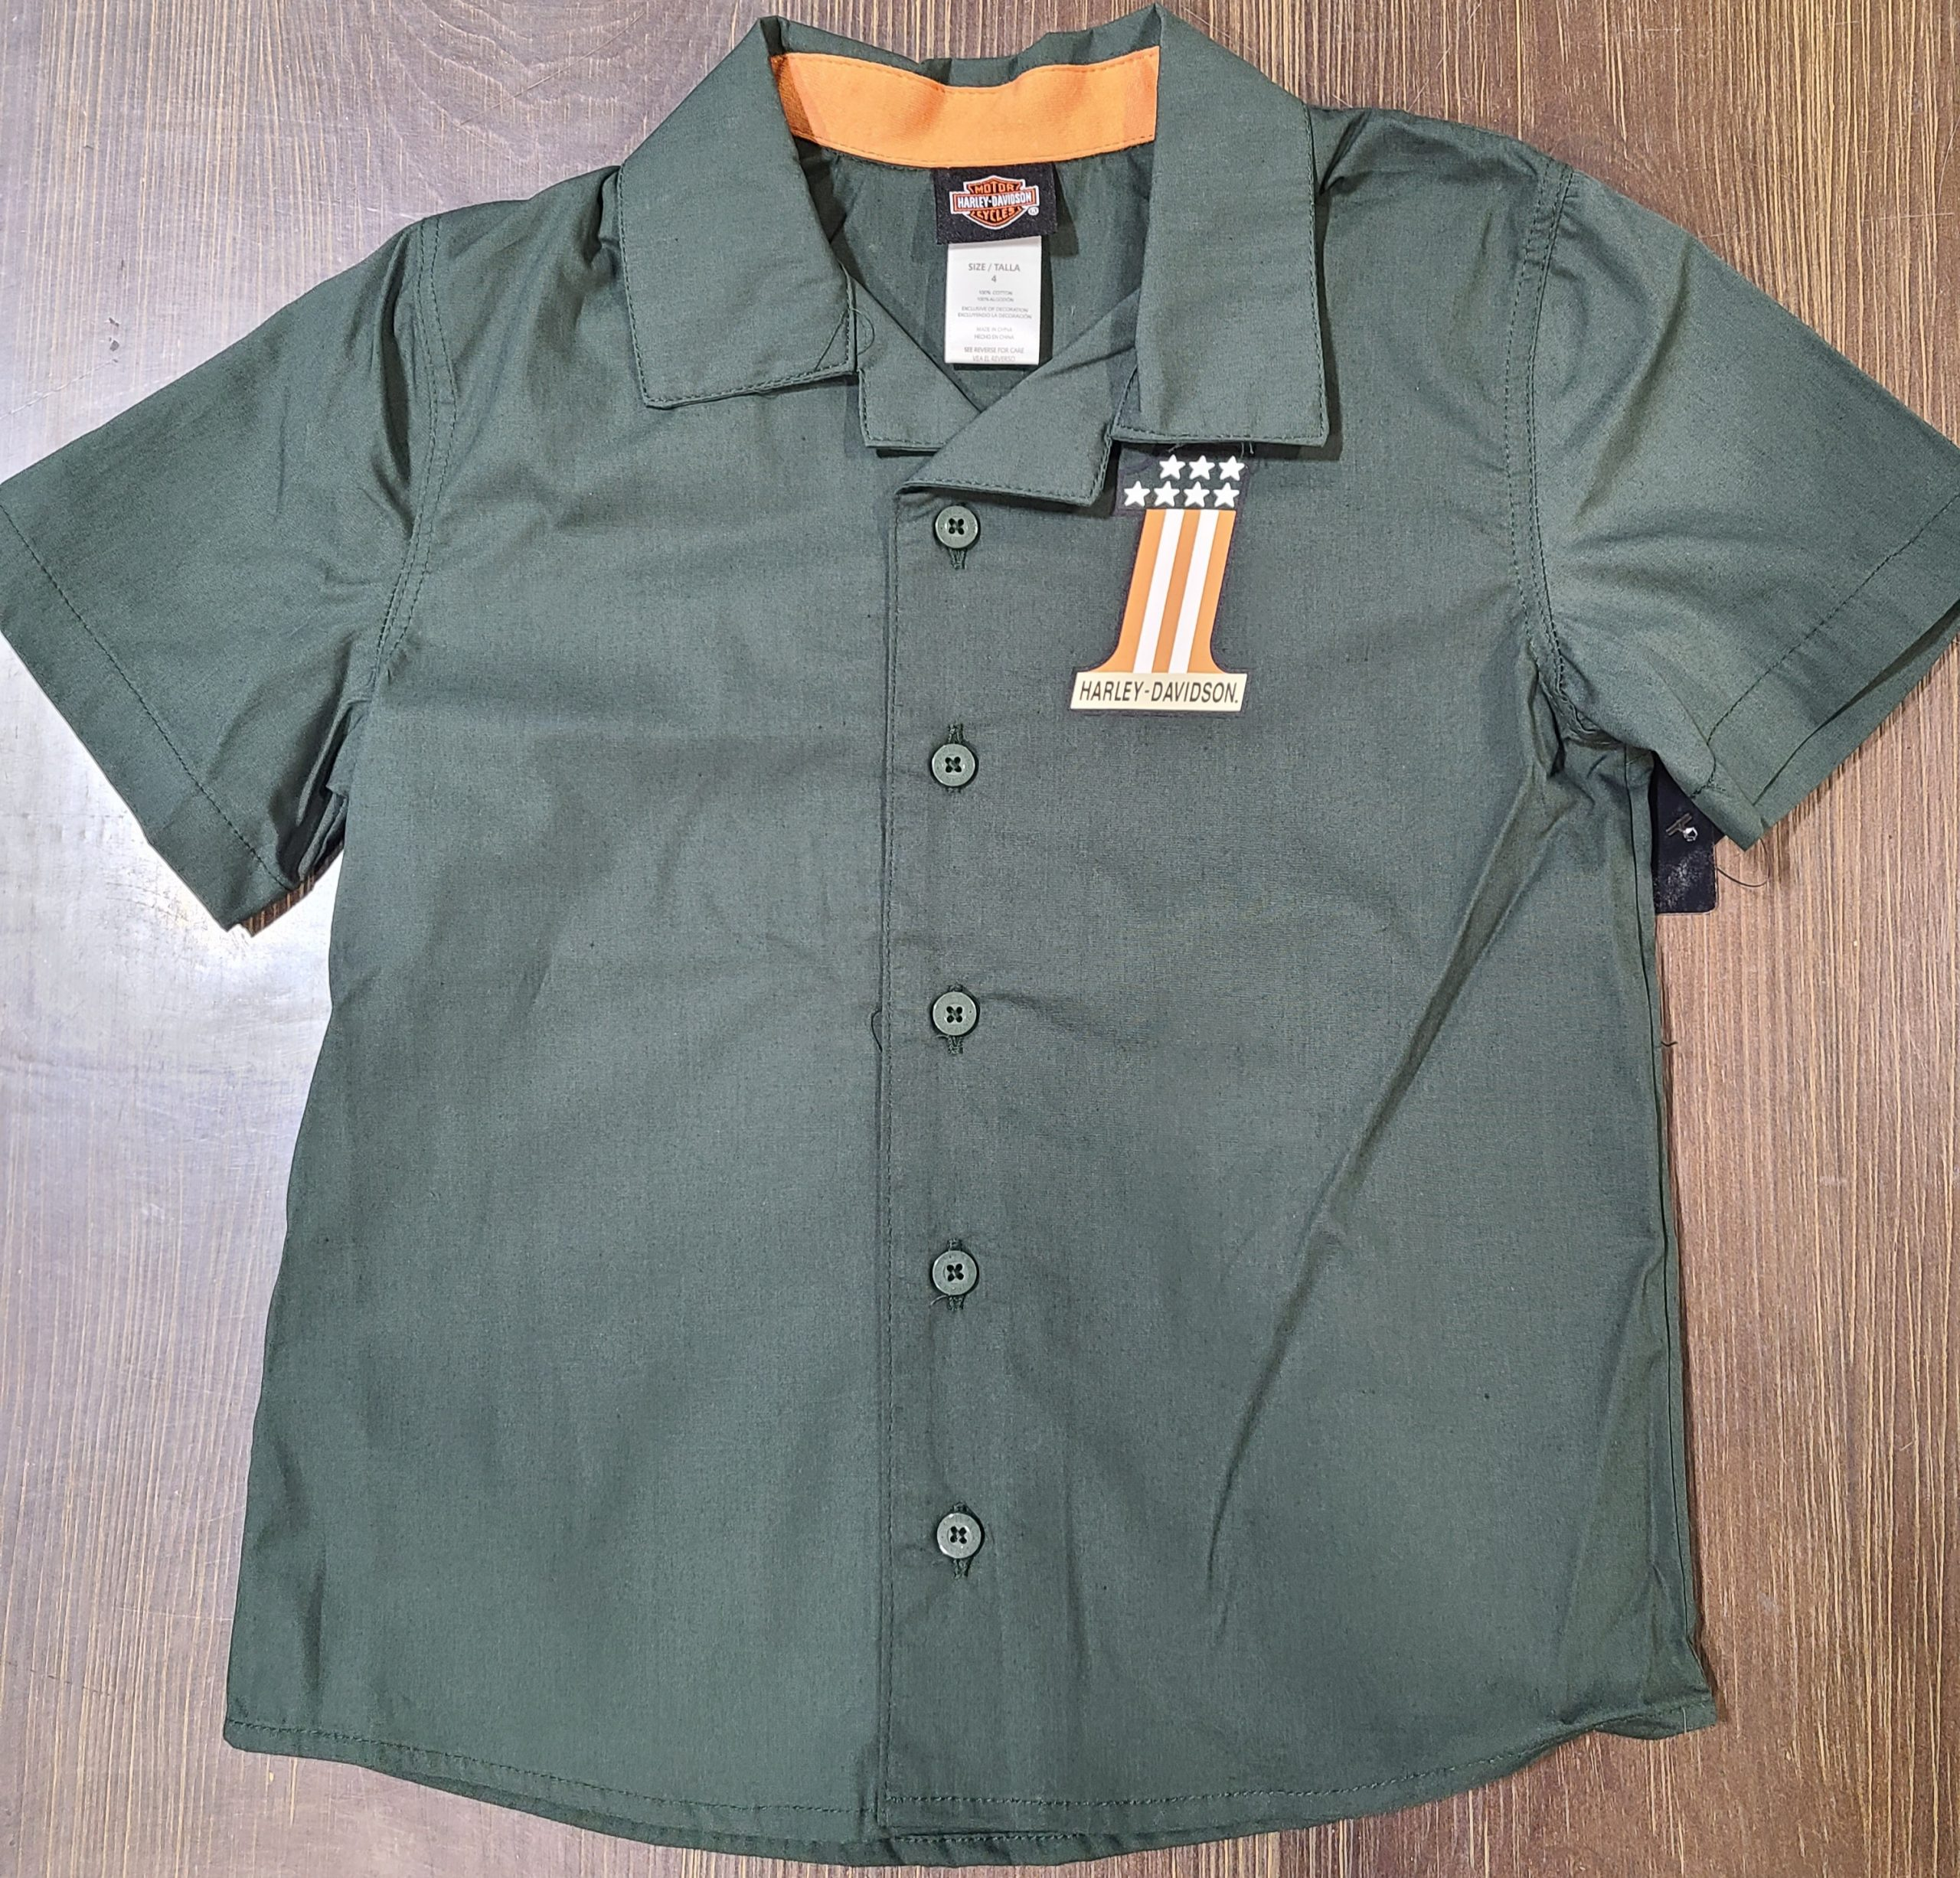 HARLEY DAVIDSON LTL BOY POPLN SHOP SHIRT GREEN SIZE 8/10-12/14